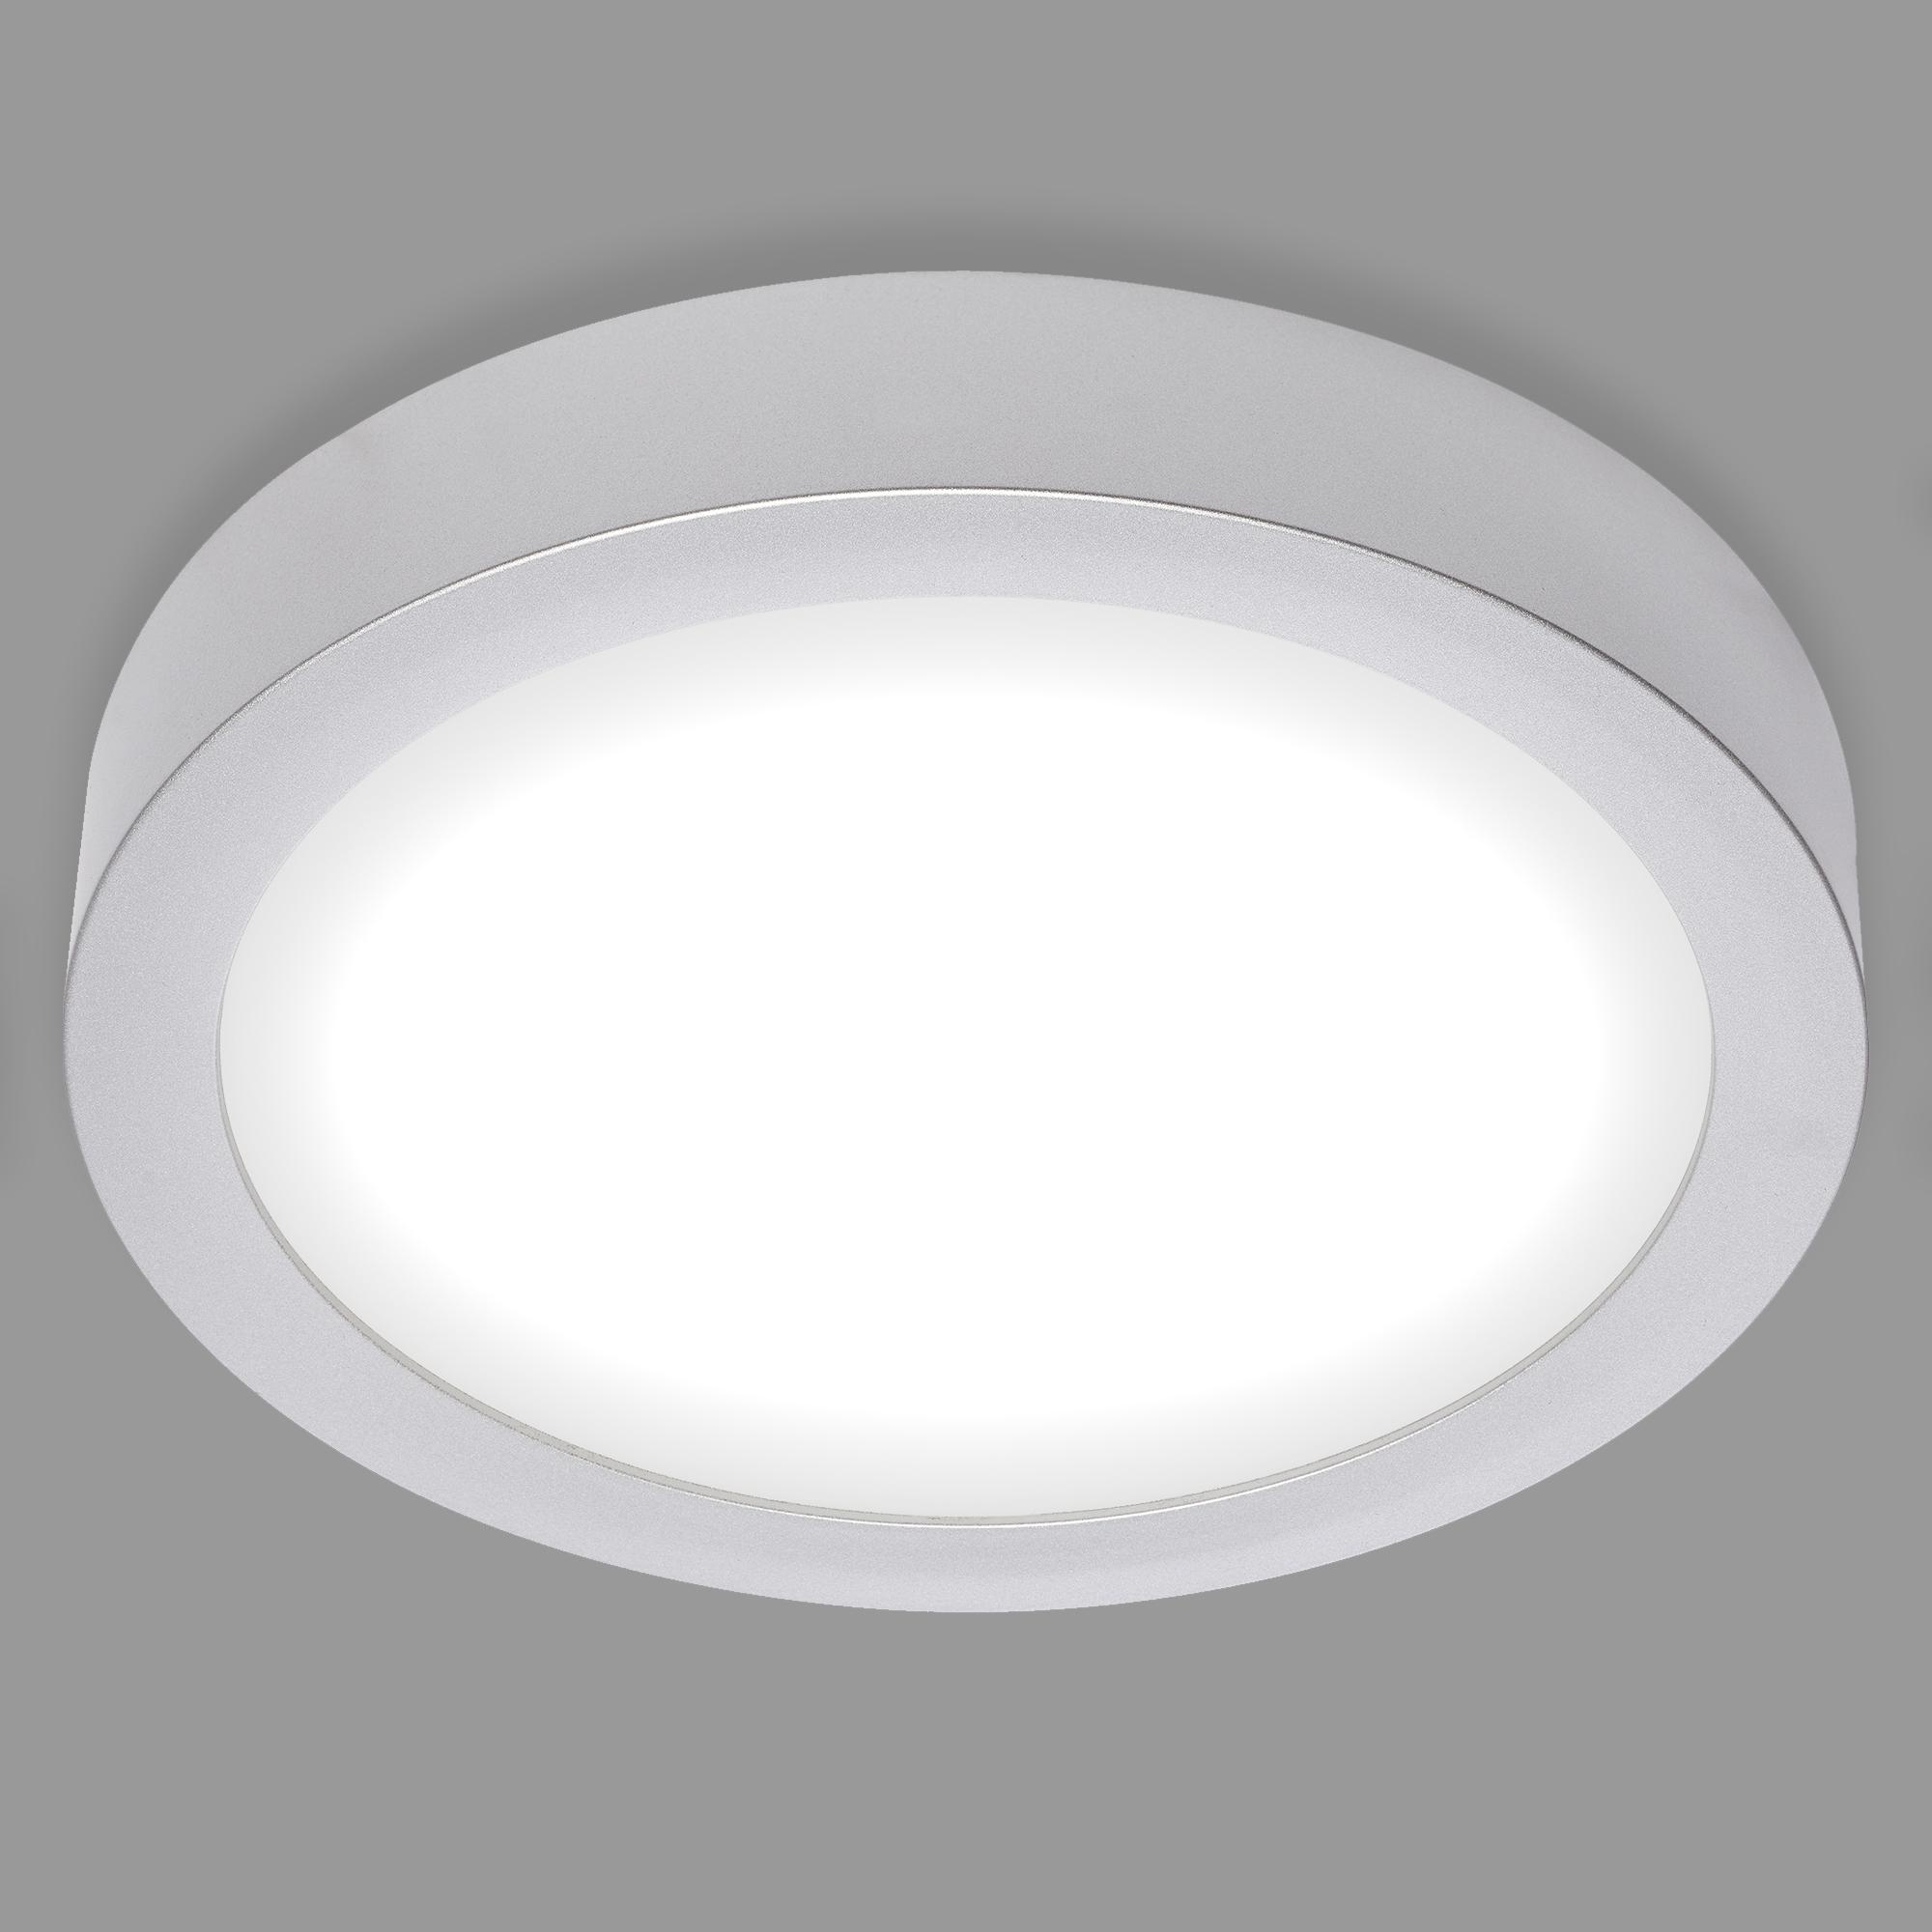 LED Deckenleuchte, Ø 22,5 cm, 17 W, Chrom-Matt